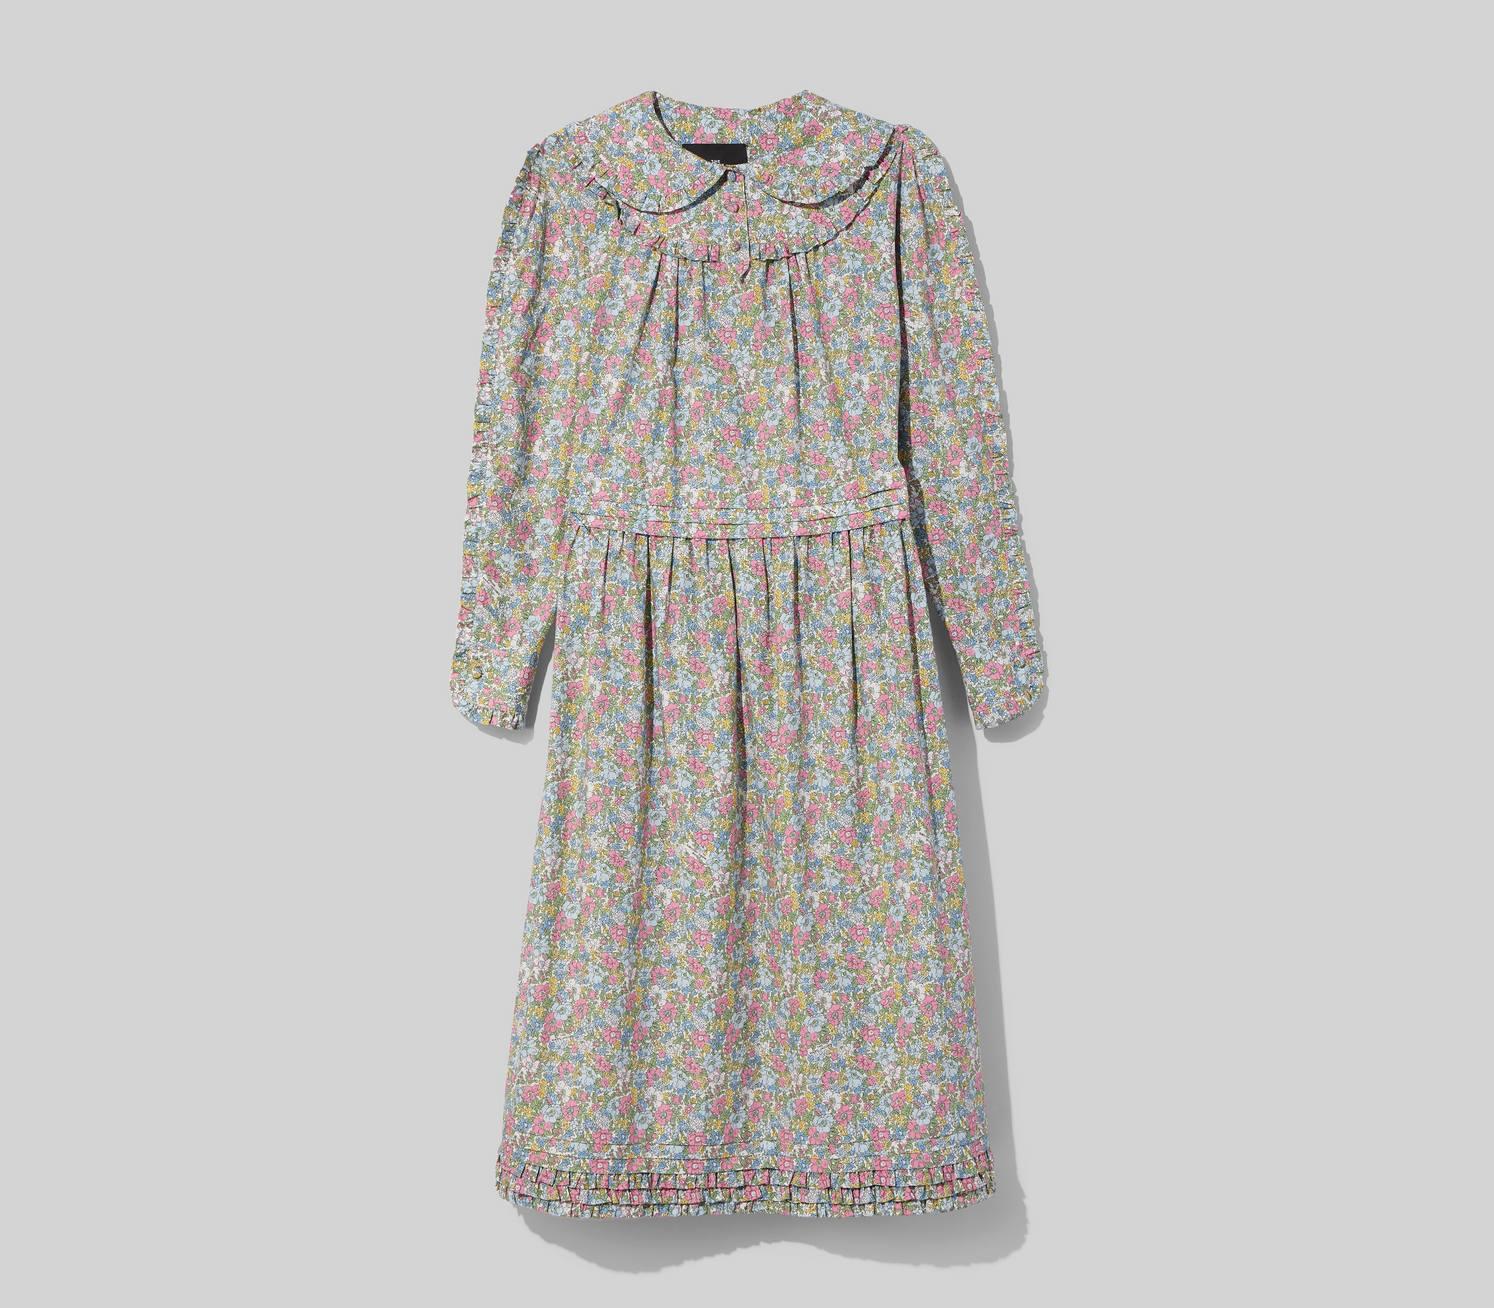 MARC JACOBS Smock Dress